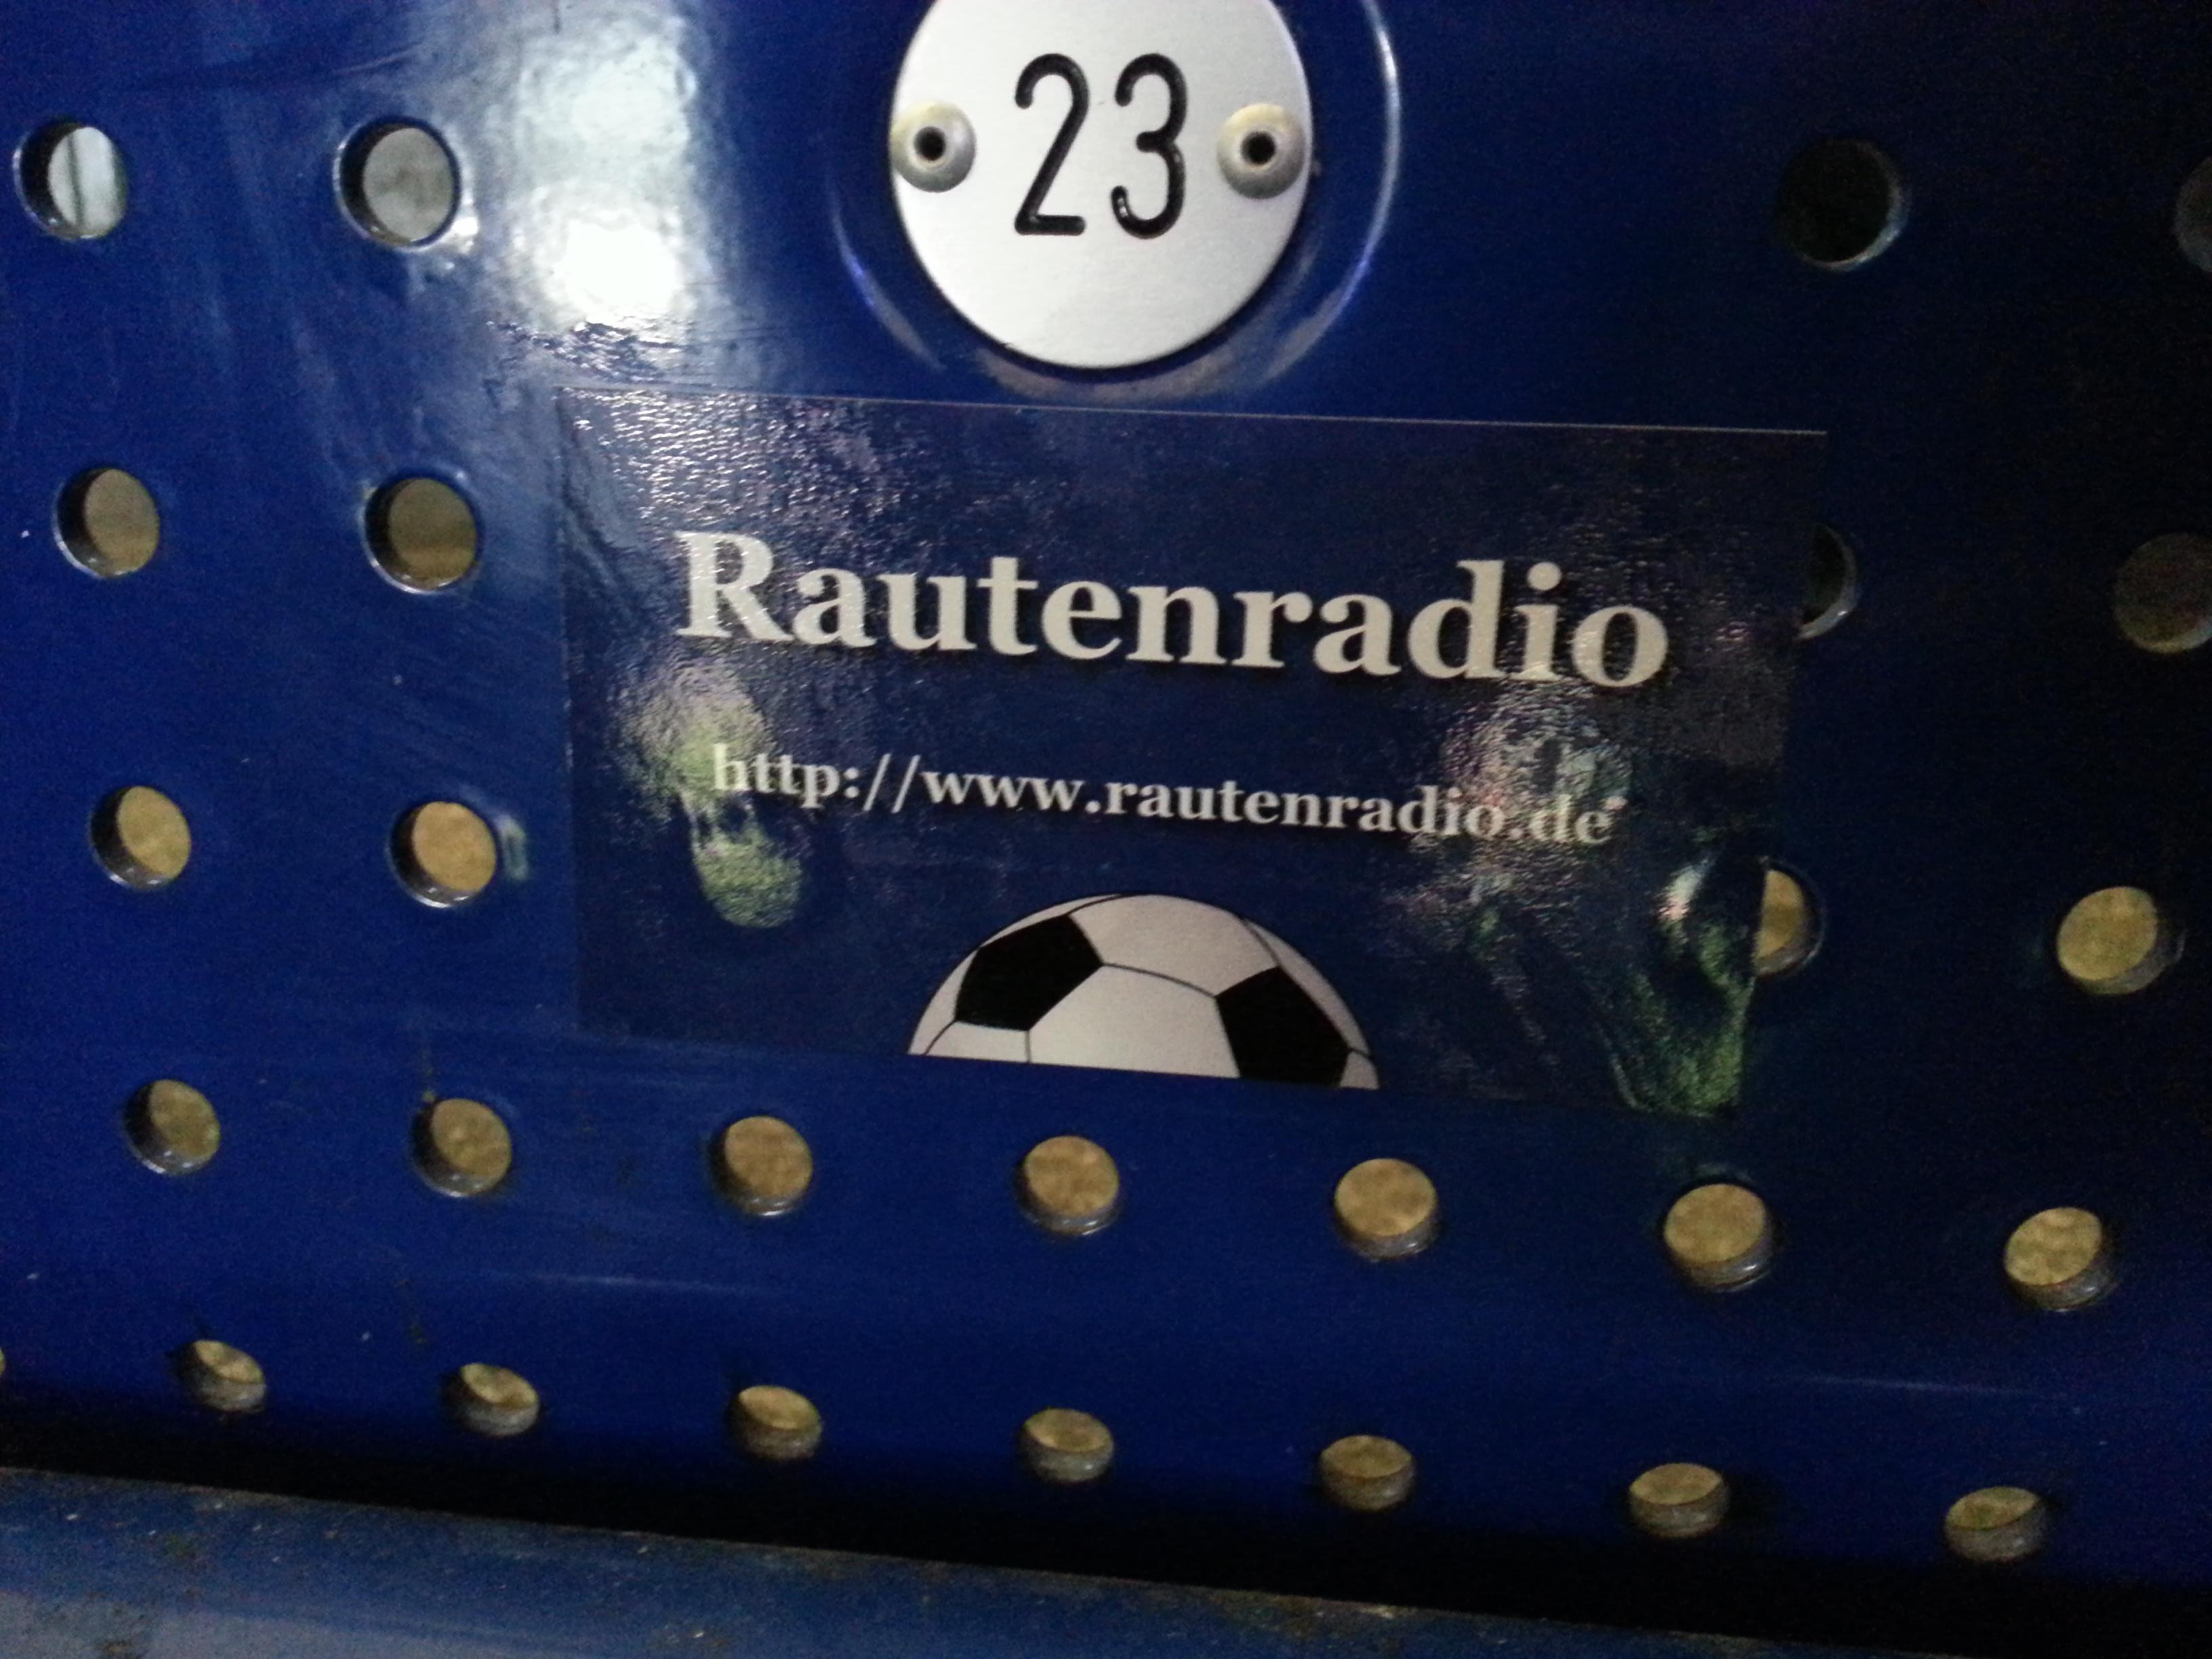 RautenRadio.de weiß alles